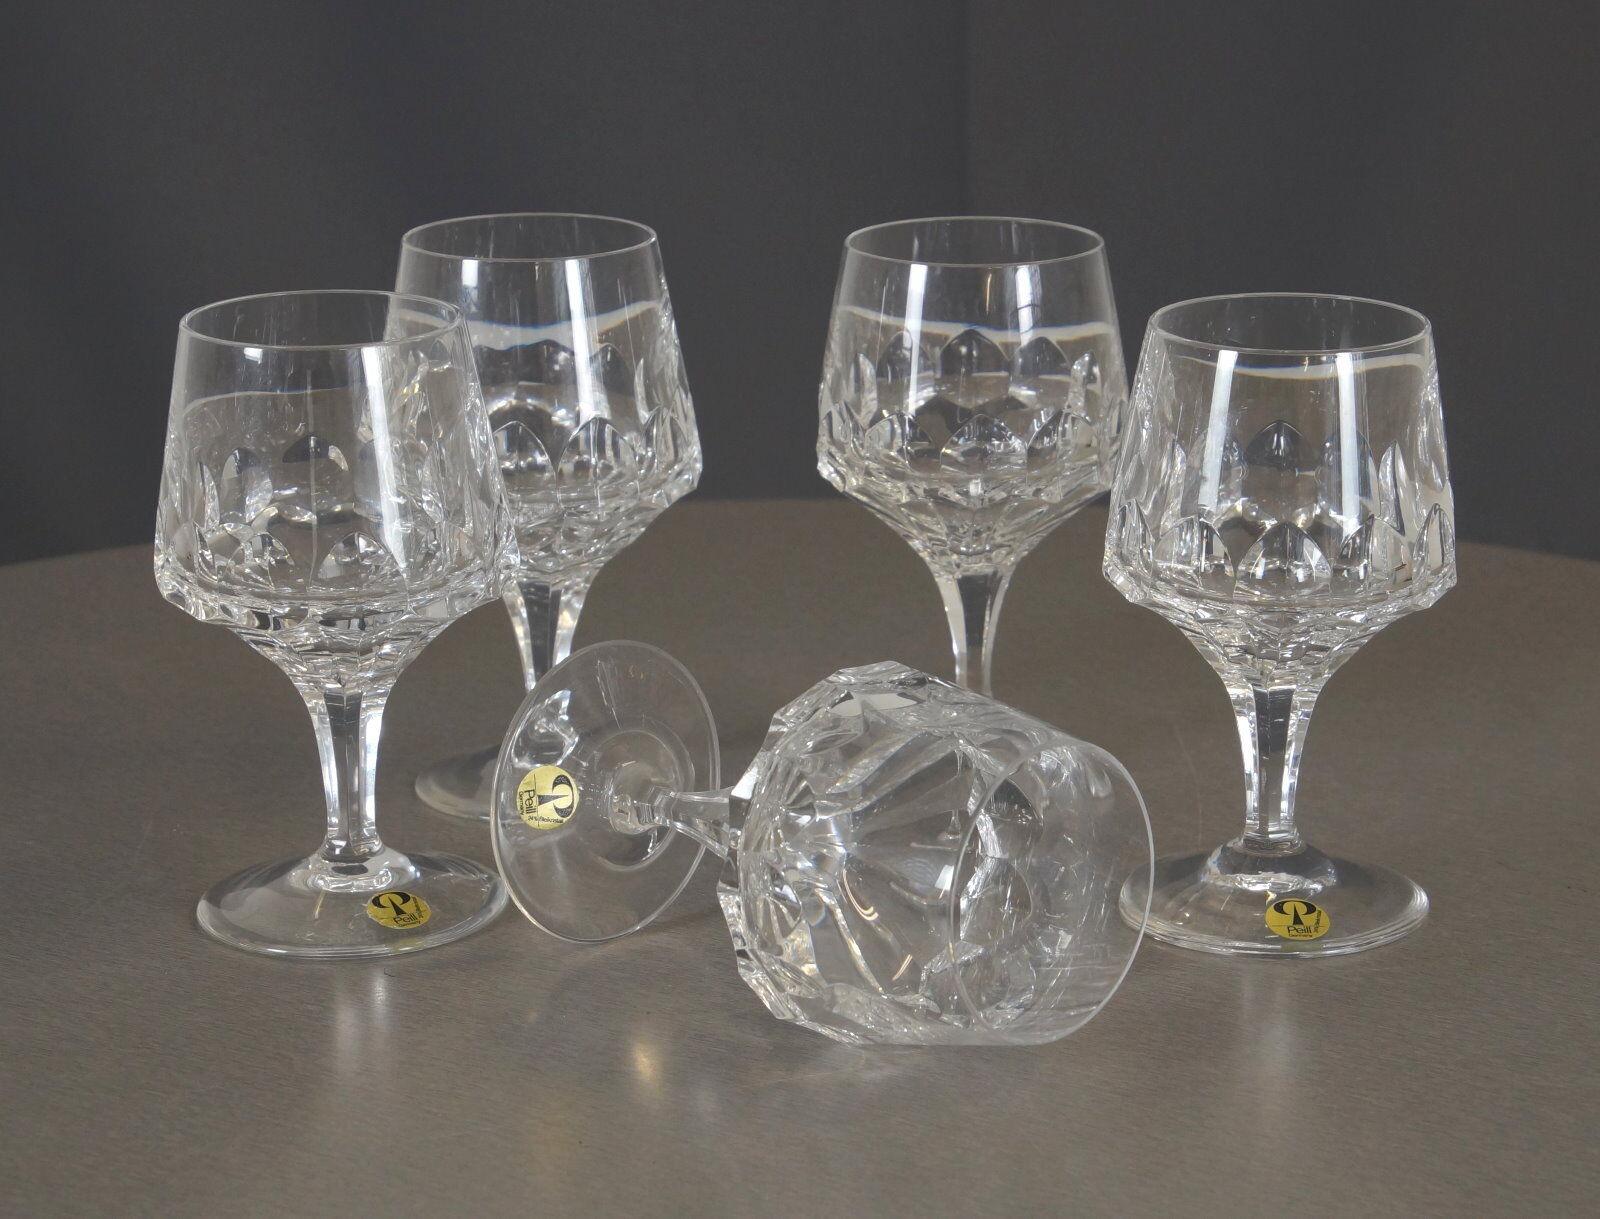 5 Peill + Putzler Bleikristall Brandy Weinbrand Glas Mercator Messina 60er Jahre